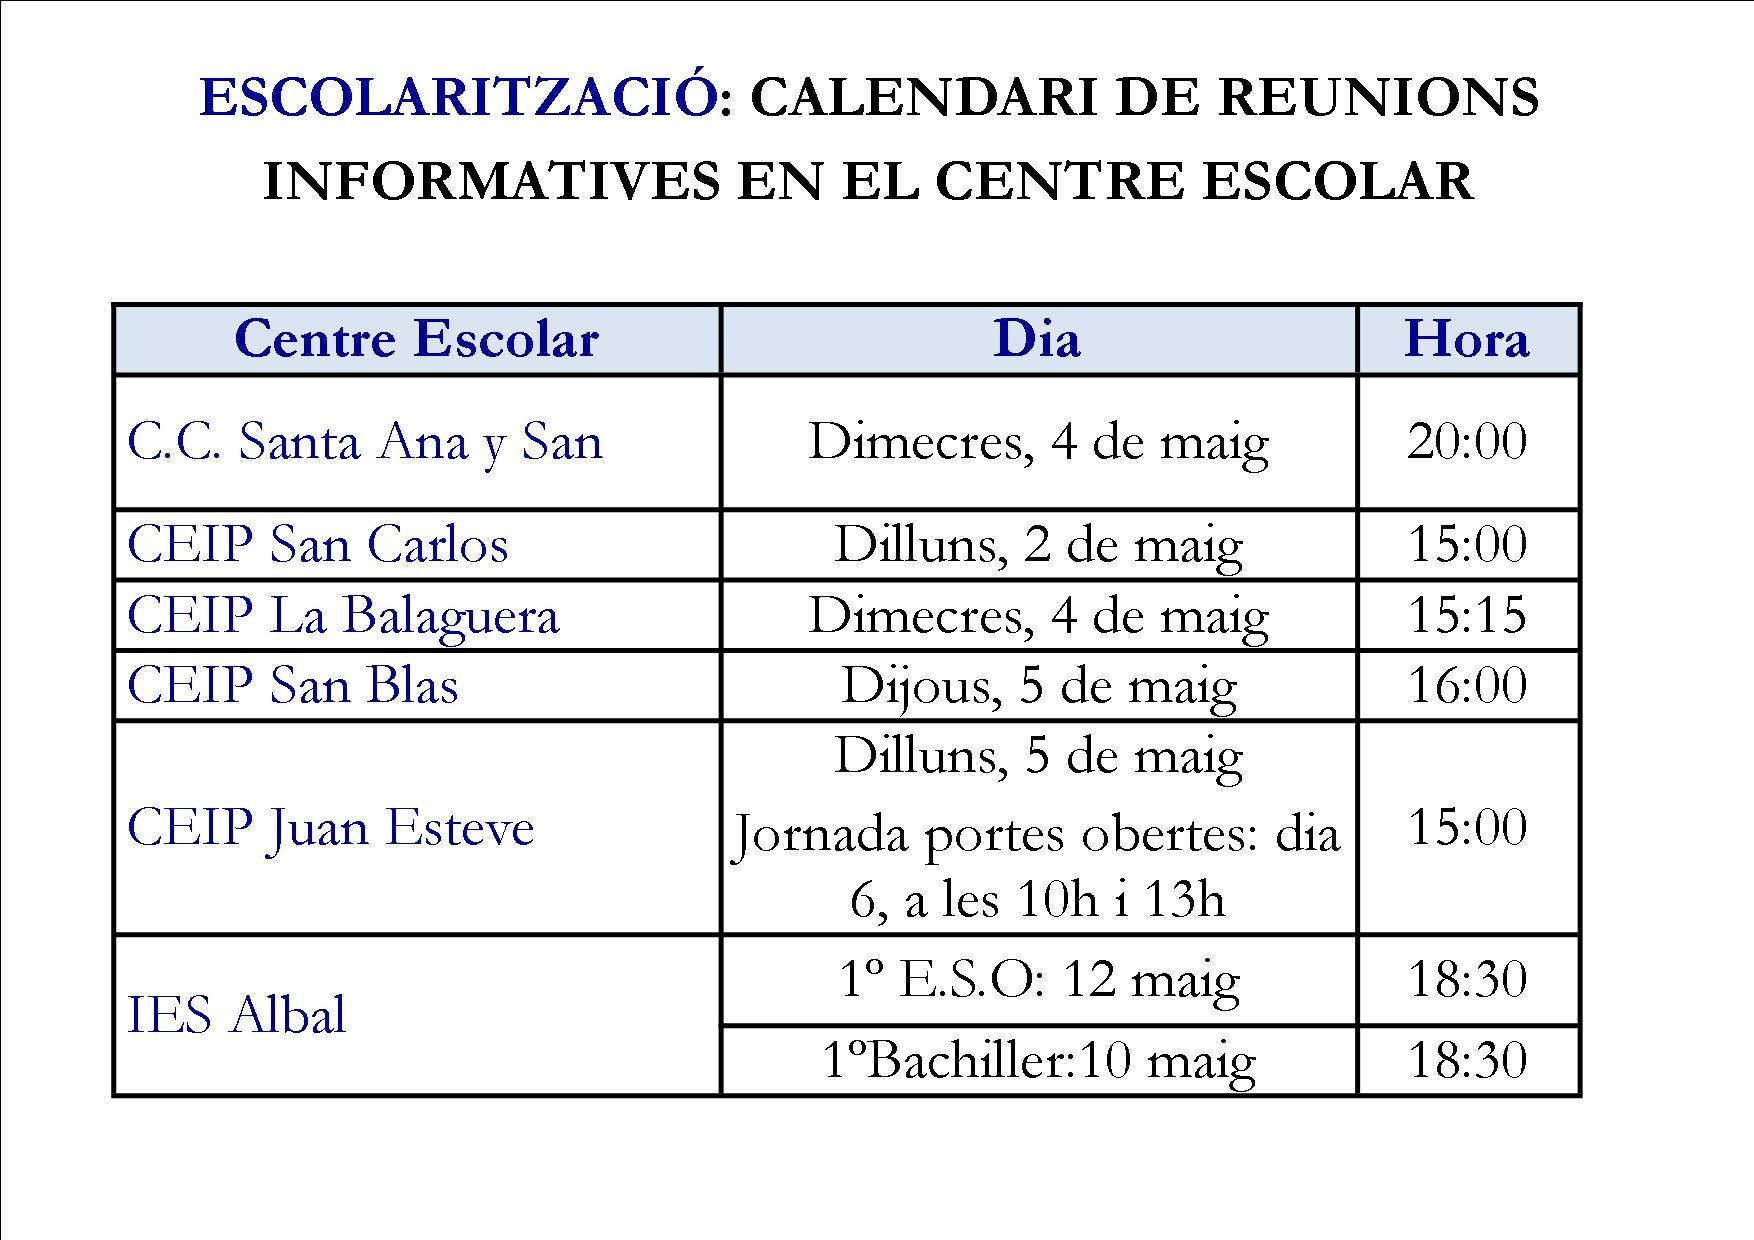 Calendario Escolar 2017-18 Sep Para Imprimir Más Recientes Mestre A Casa Ceip La Balaguera Albal Inici Of Calendario Escolar 2017-18 Sep Para Imprimir Más Actual Home Page